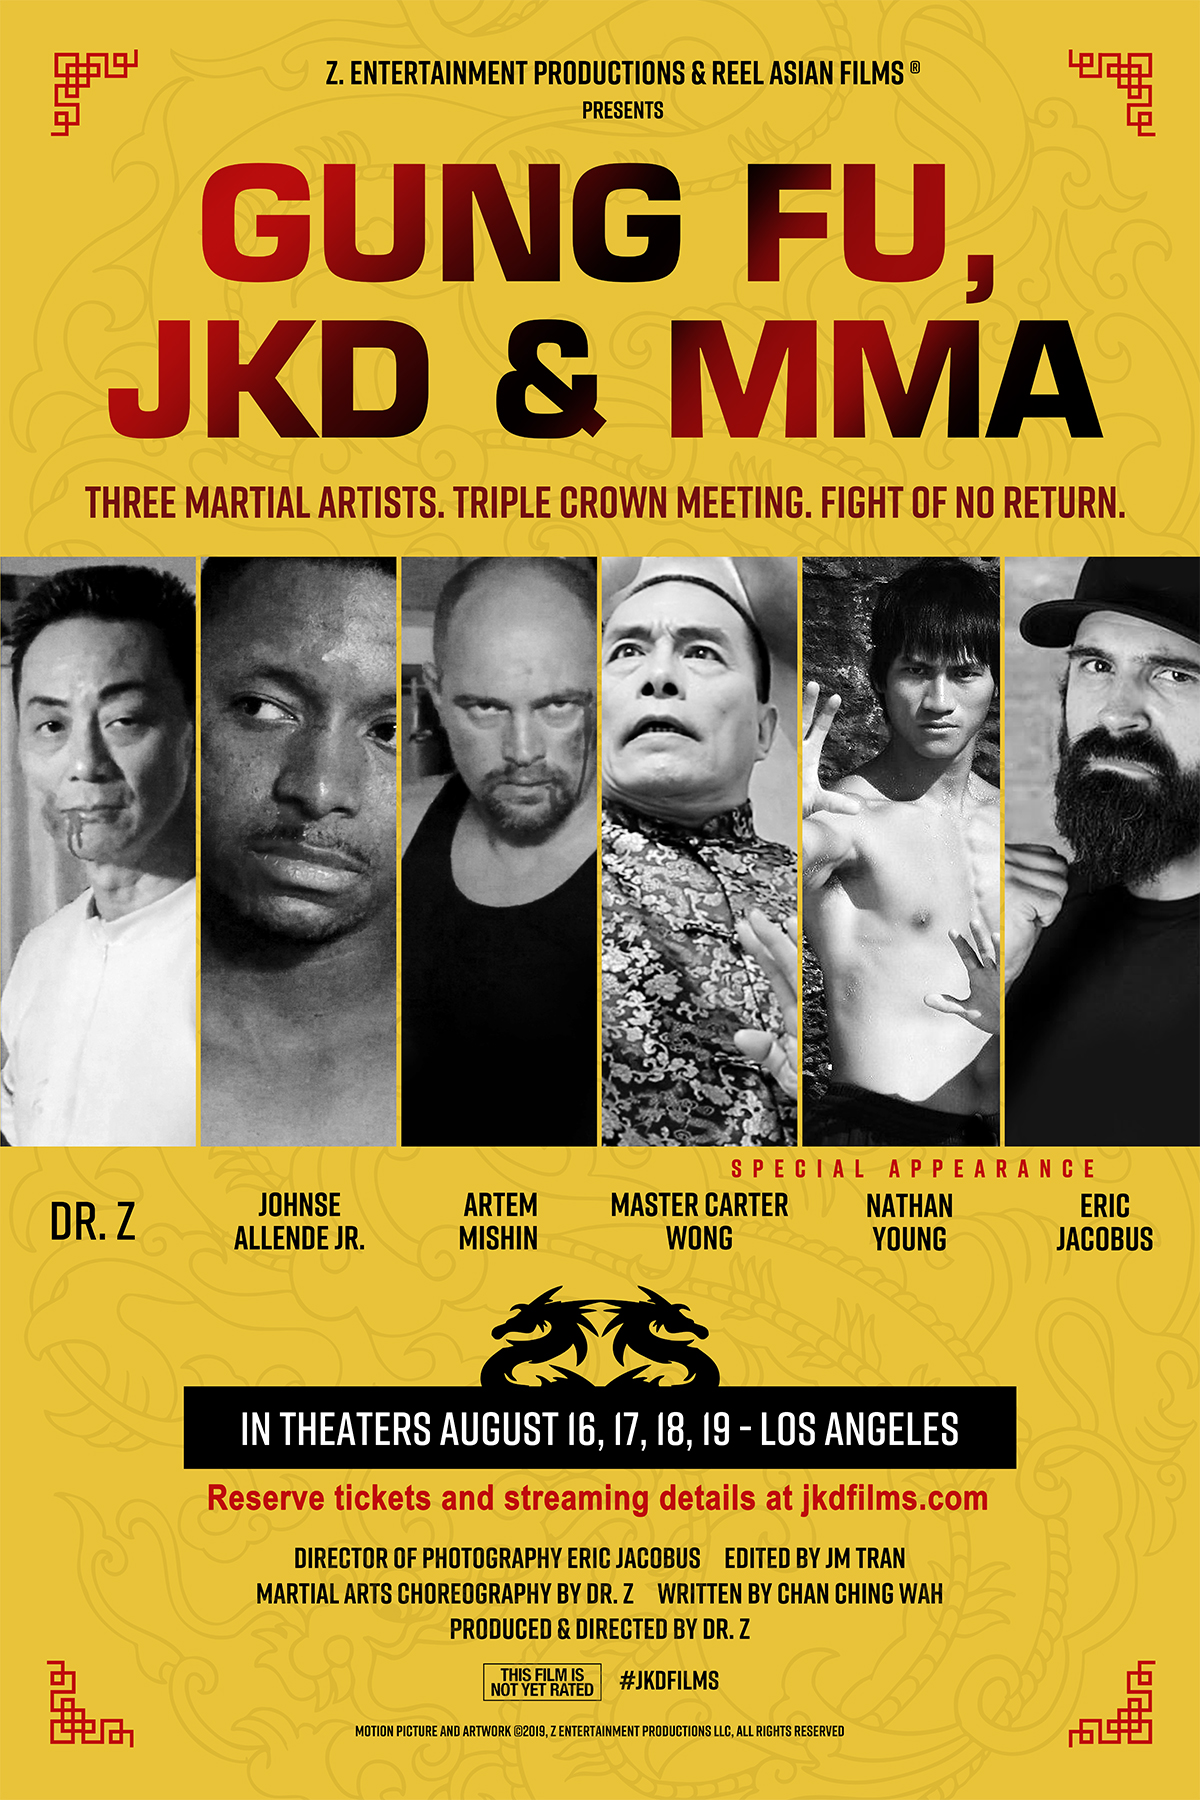 Gung-Fu-JKD-and-MMA.jpg